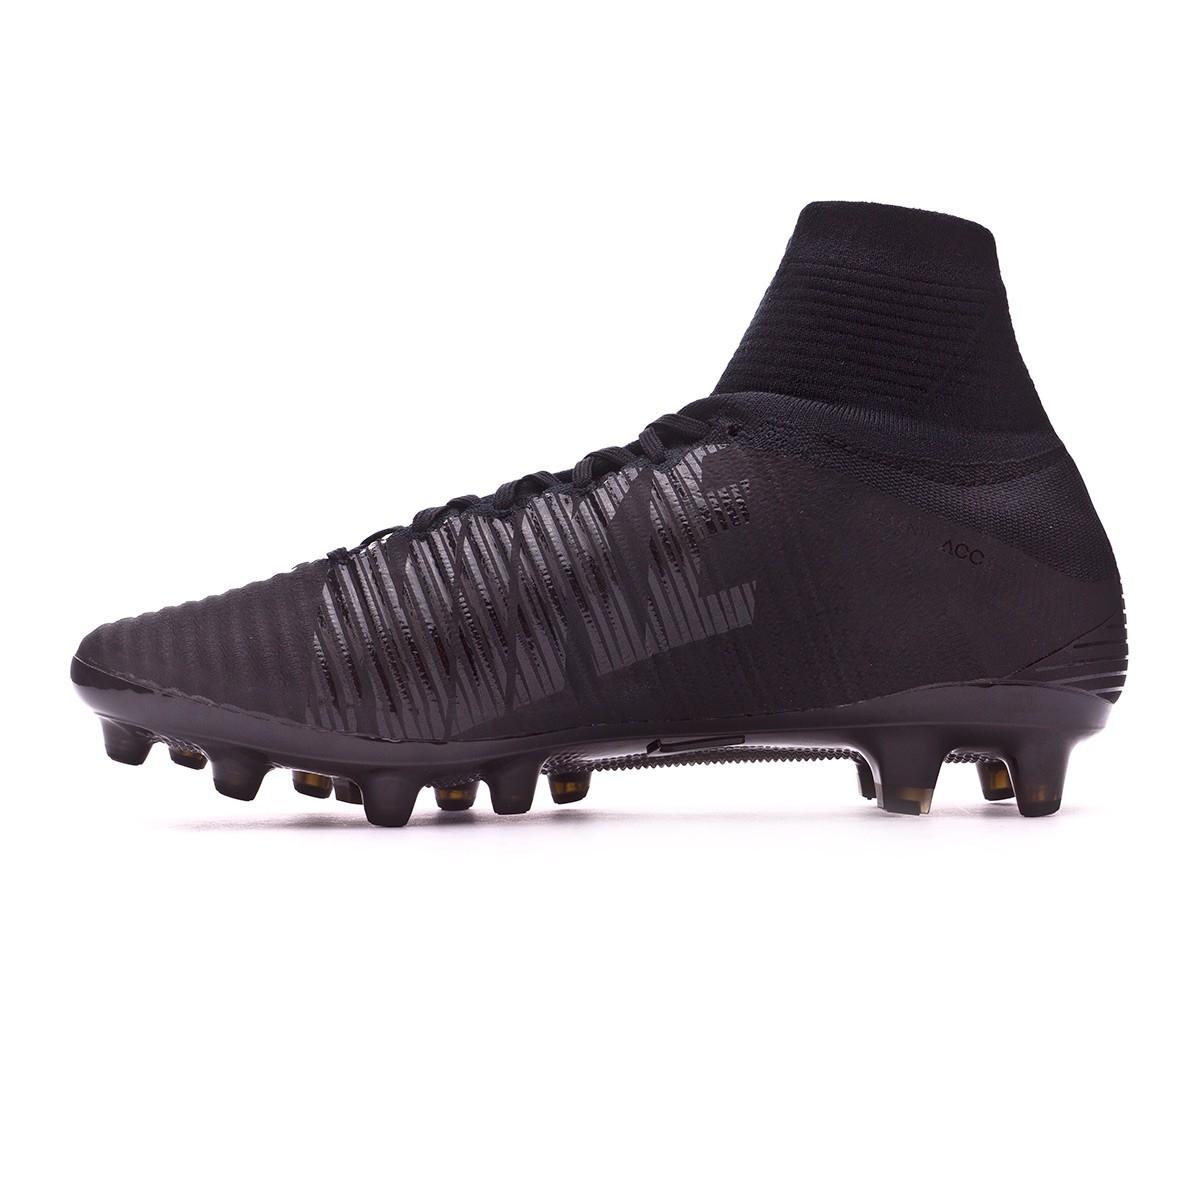 aec1b678df4 Football Boots Nike Mercurial Superfly V AG-Pro Black - Football store  Fútbol Emotion